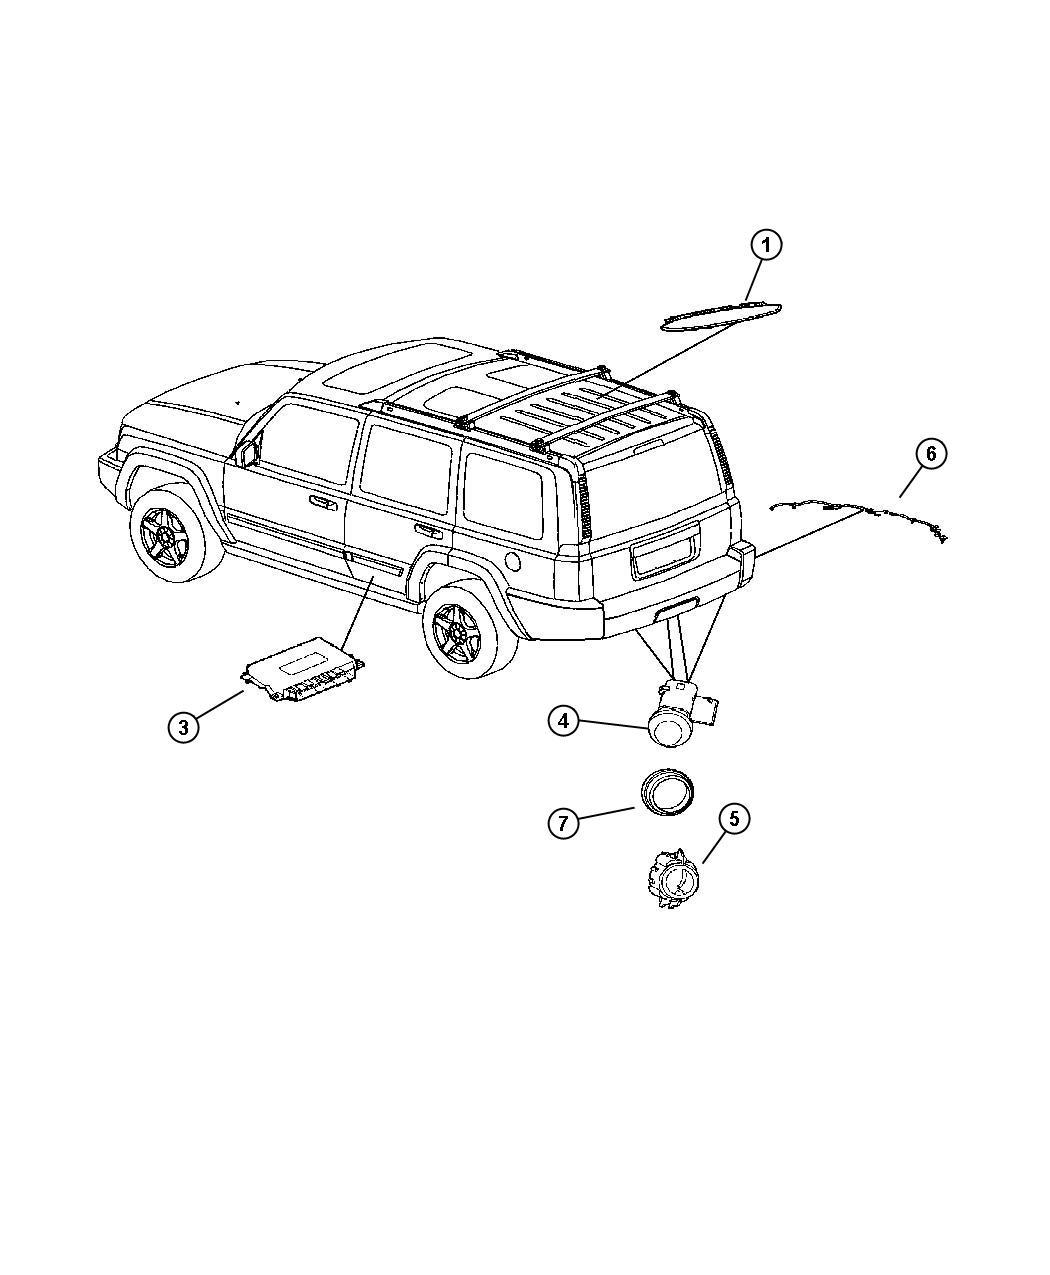 2007 Jeep Commander Harness  Wiring  Rear Fascia  Sensor